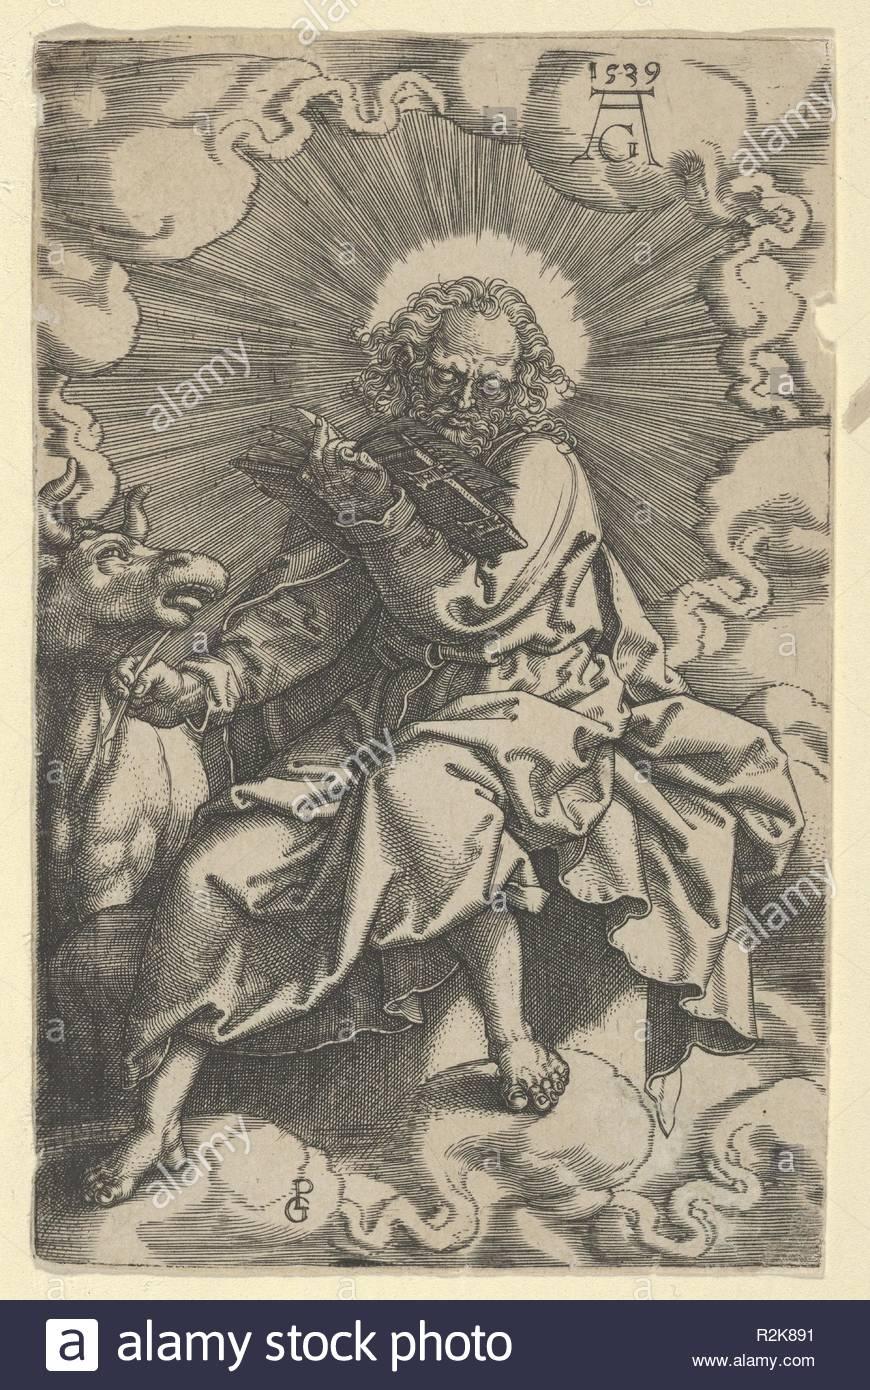 Saint Luke, from The Four Evangelists. Artist: Heinrich Aldegrever (German, Paderborn ca. 1502-1555/1561 Soest); after Georg Pencz (German, Wroclaw ca. 1500-1550 Leipzig). Dimensions: Sheet: 4 5/8 × 3 in. (11.8 × 7.6 cm). Date: 1539. Museum: Metropolitan Museum of Art, New York, USA. - Stock Image